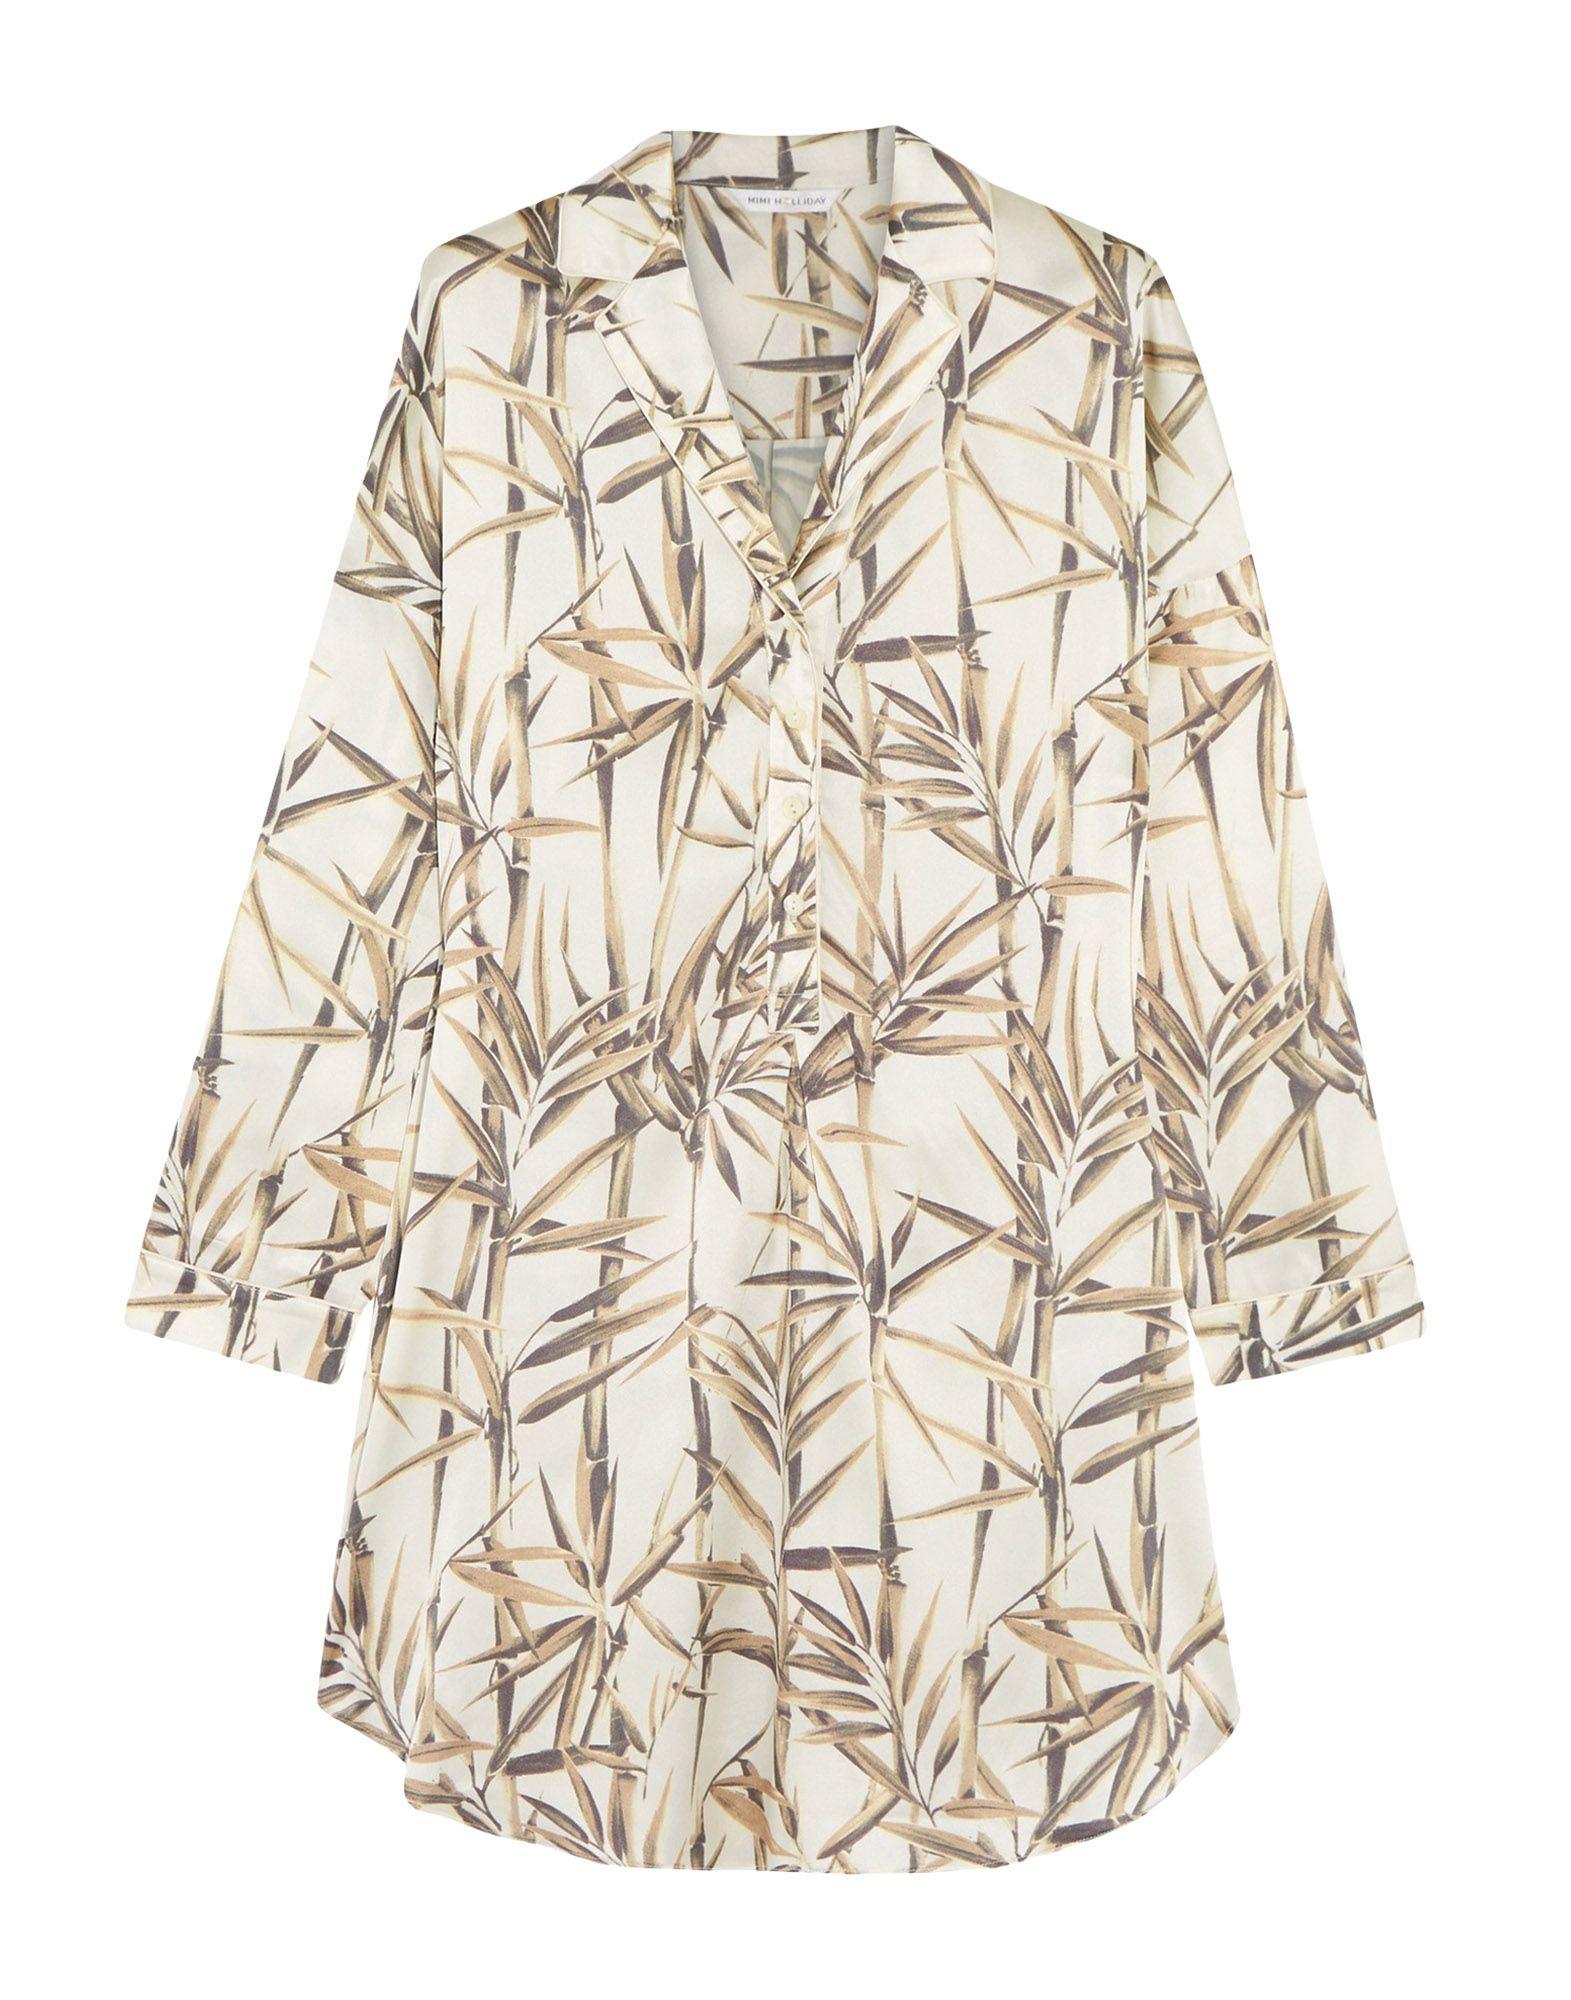 MIMI HOLLIDAY by DAMARIS Ночная рубашка mimi holliday by damaris пояс для чулок